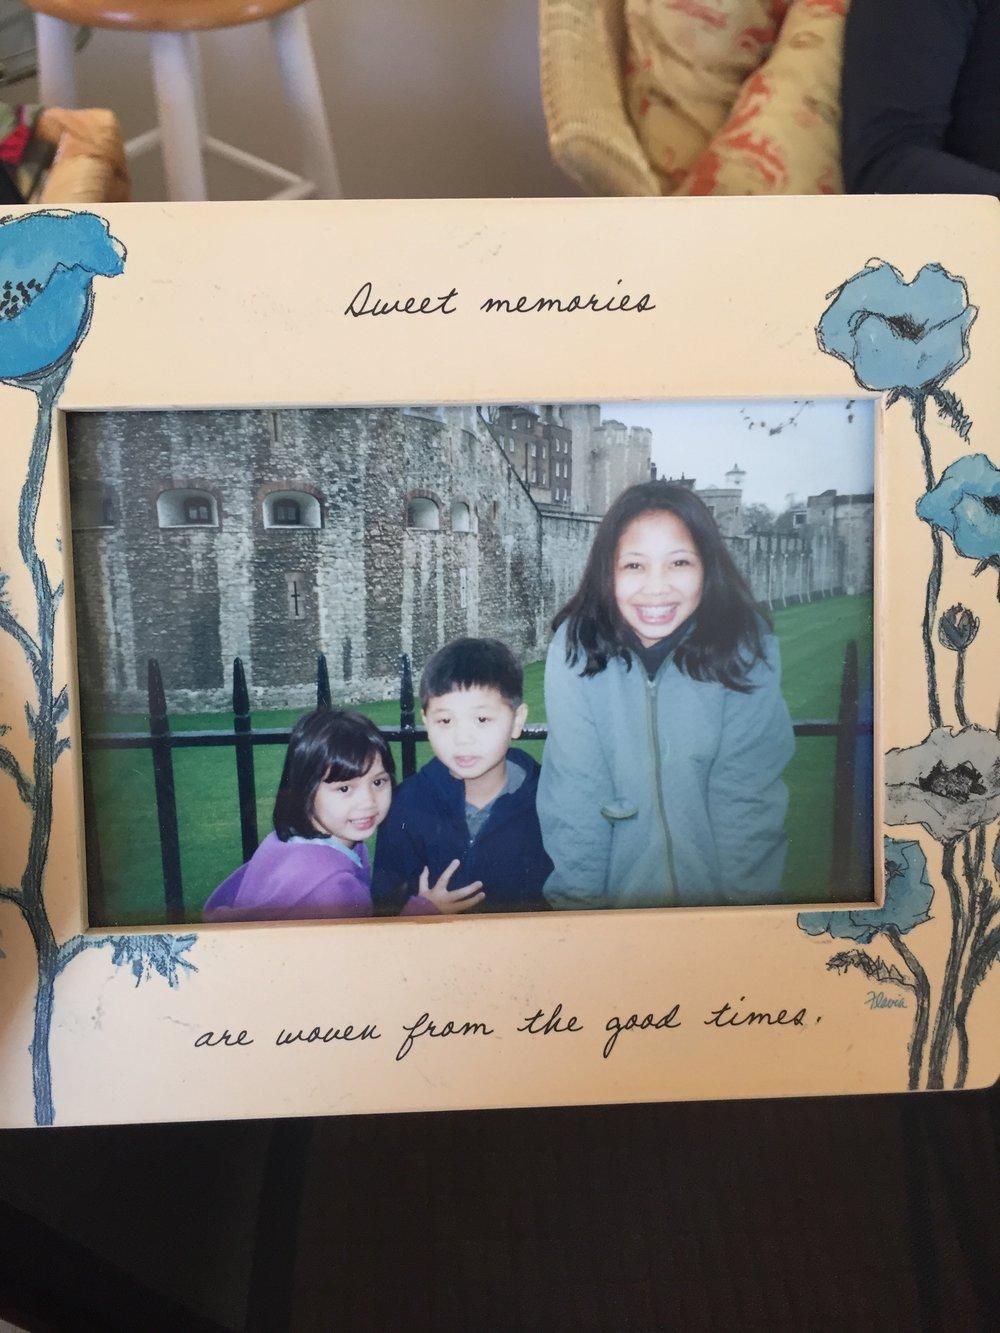 Awkward teenager me in Europe with my siblings